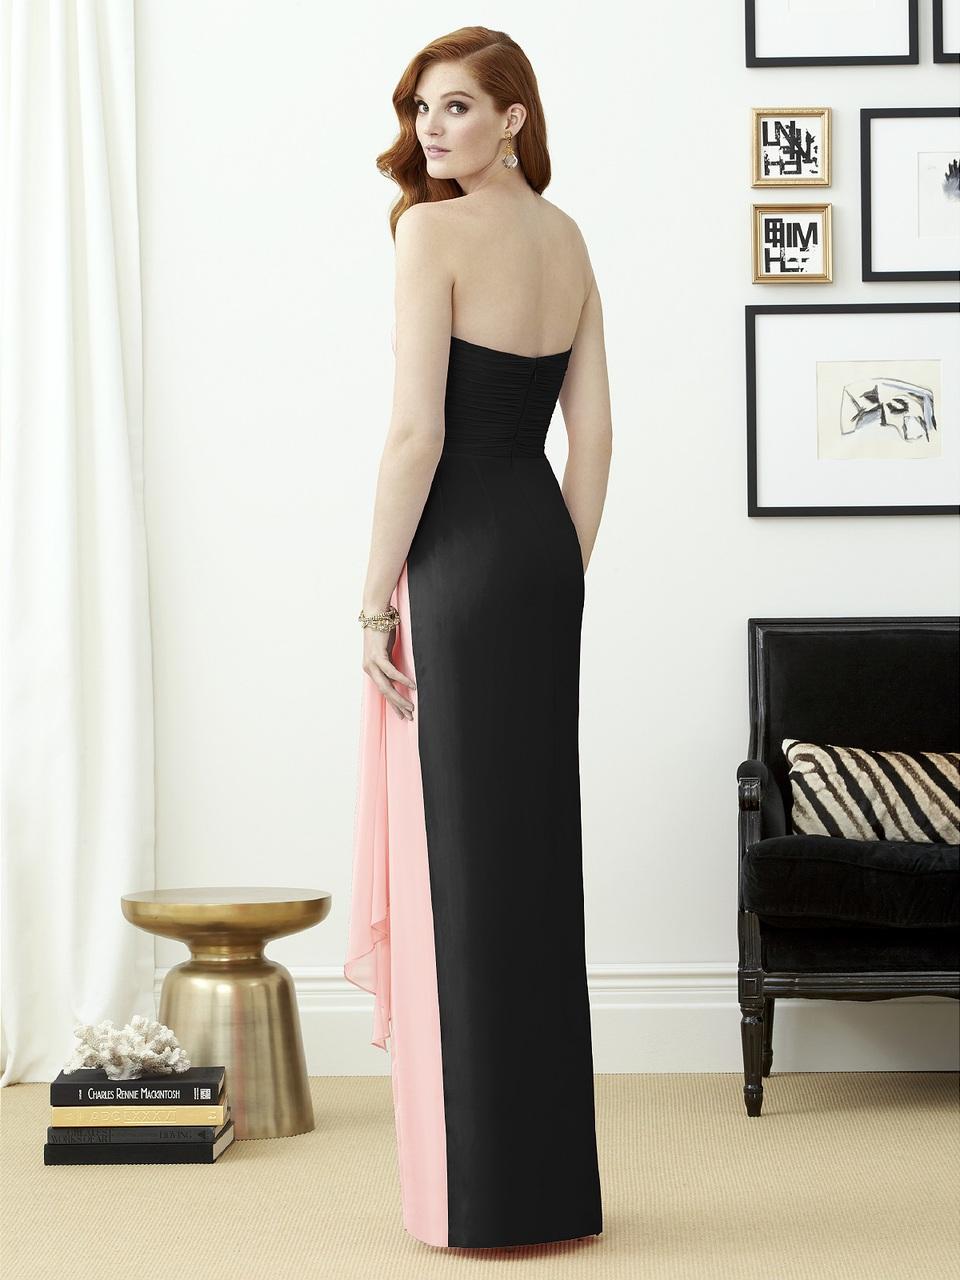 0a4c68db14fa6 Dessy Bridesmaids Dresses 2956 By Vivian Diamond - Lux Chiffon |  Bridesmaids Dresses